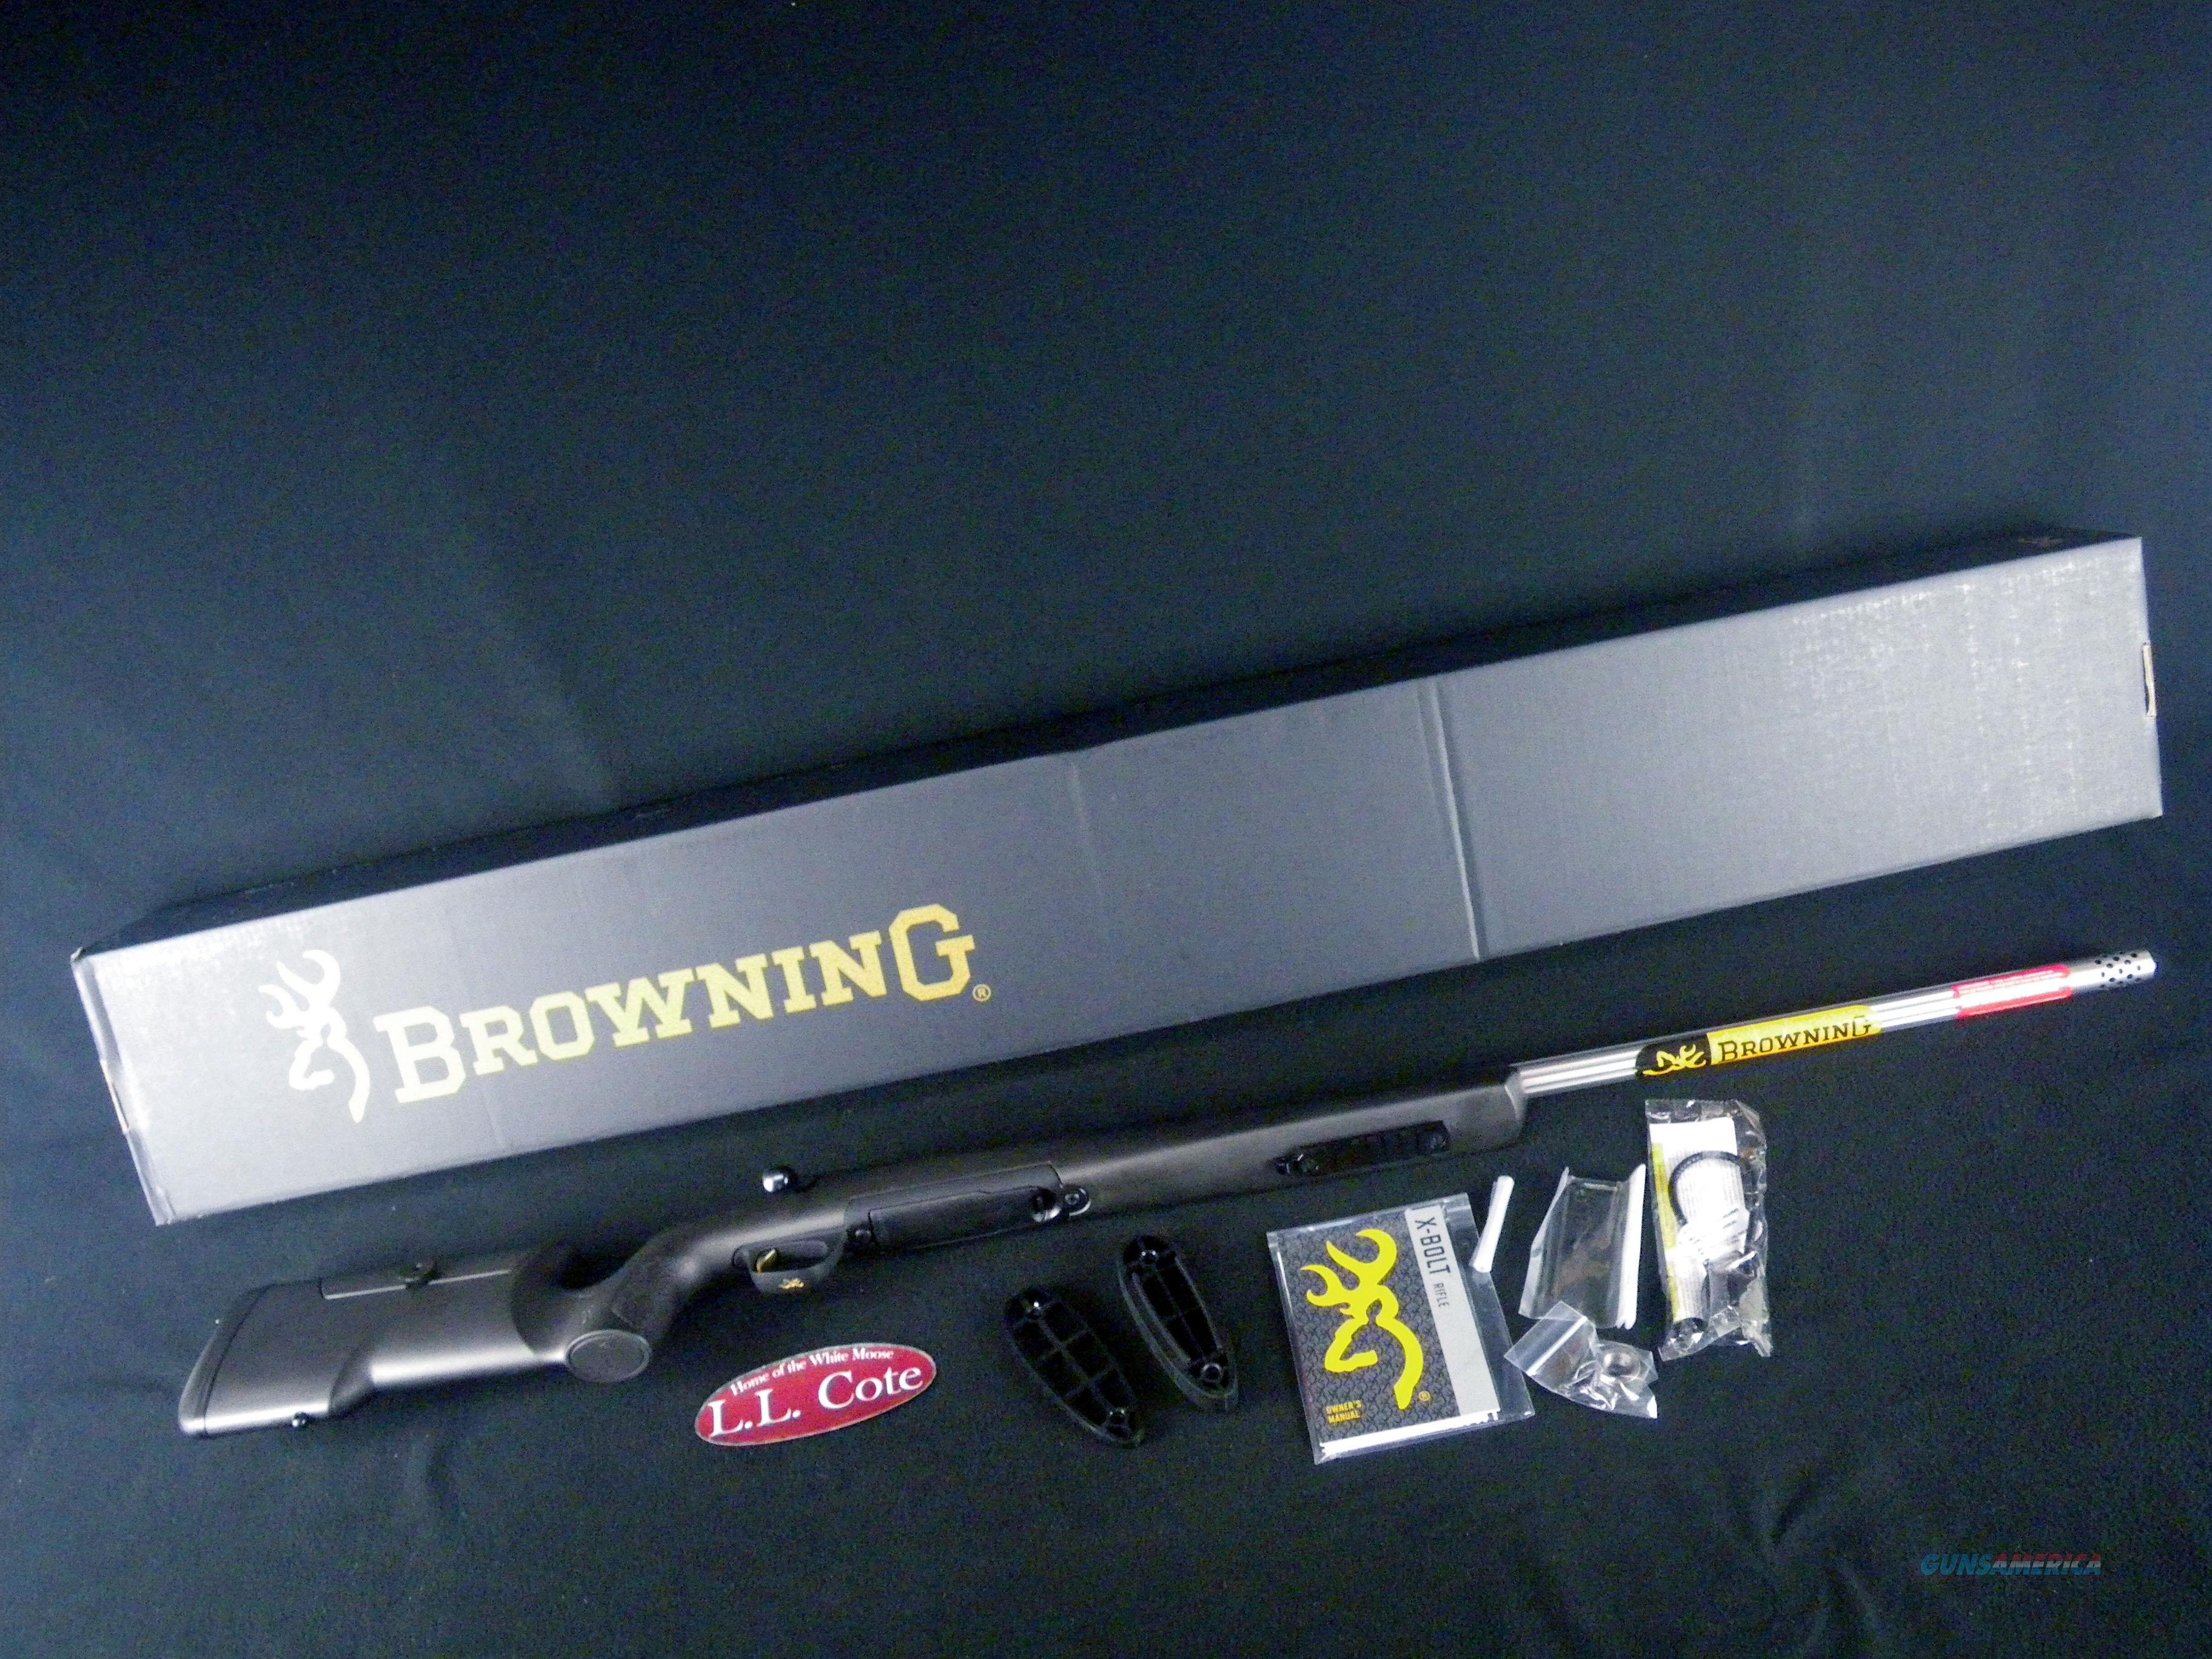 "Browning X-Bolt Max Varmint/Target 6.5 Creed 26"" NEW 035483282  Guns > Rifles > Browning Rifles > Bolt Action > Hunting > Blue"